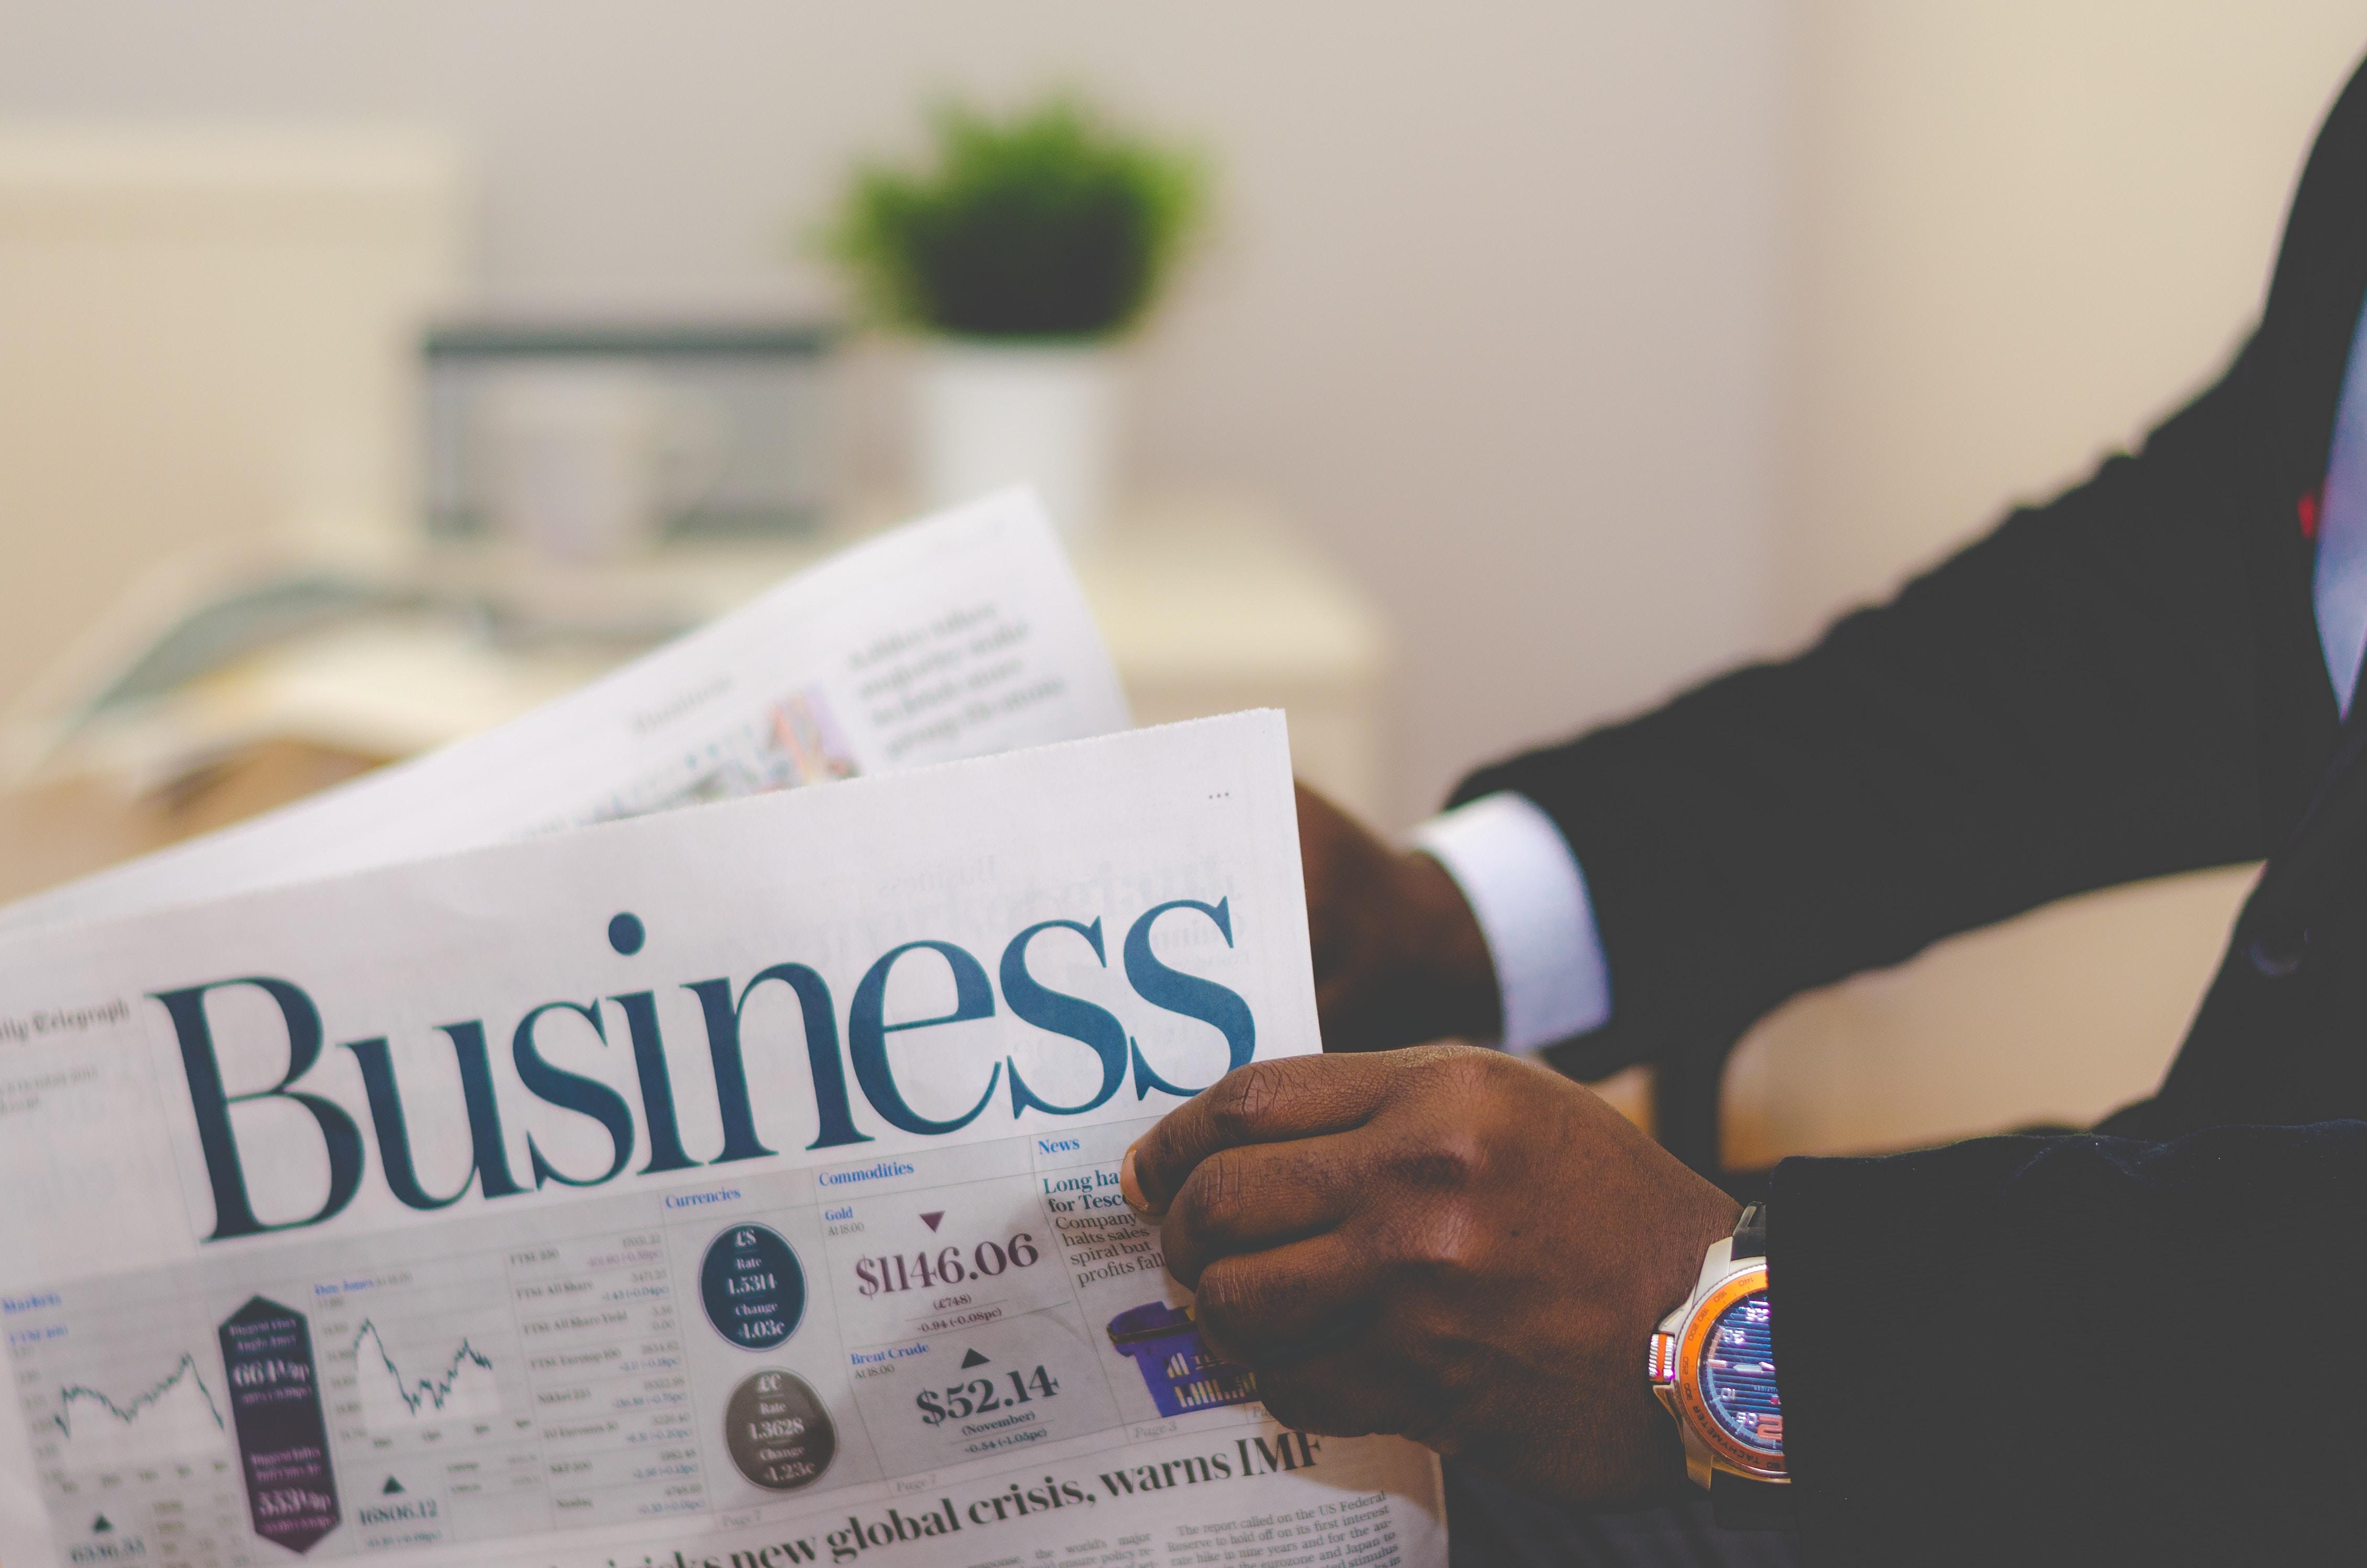 Business-newspaper